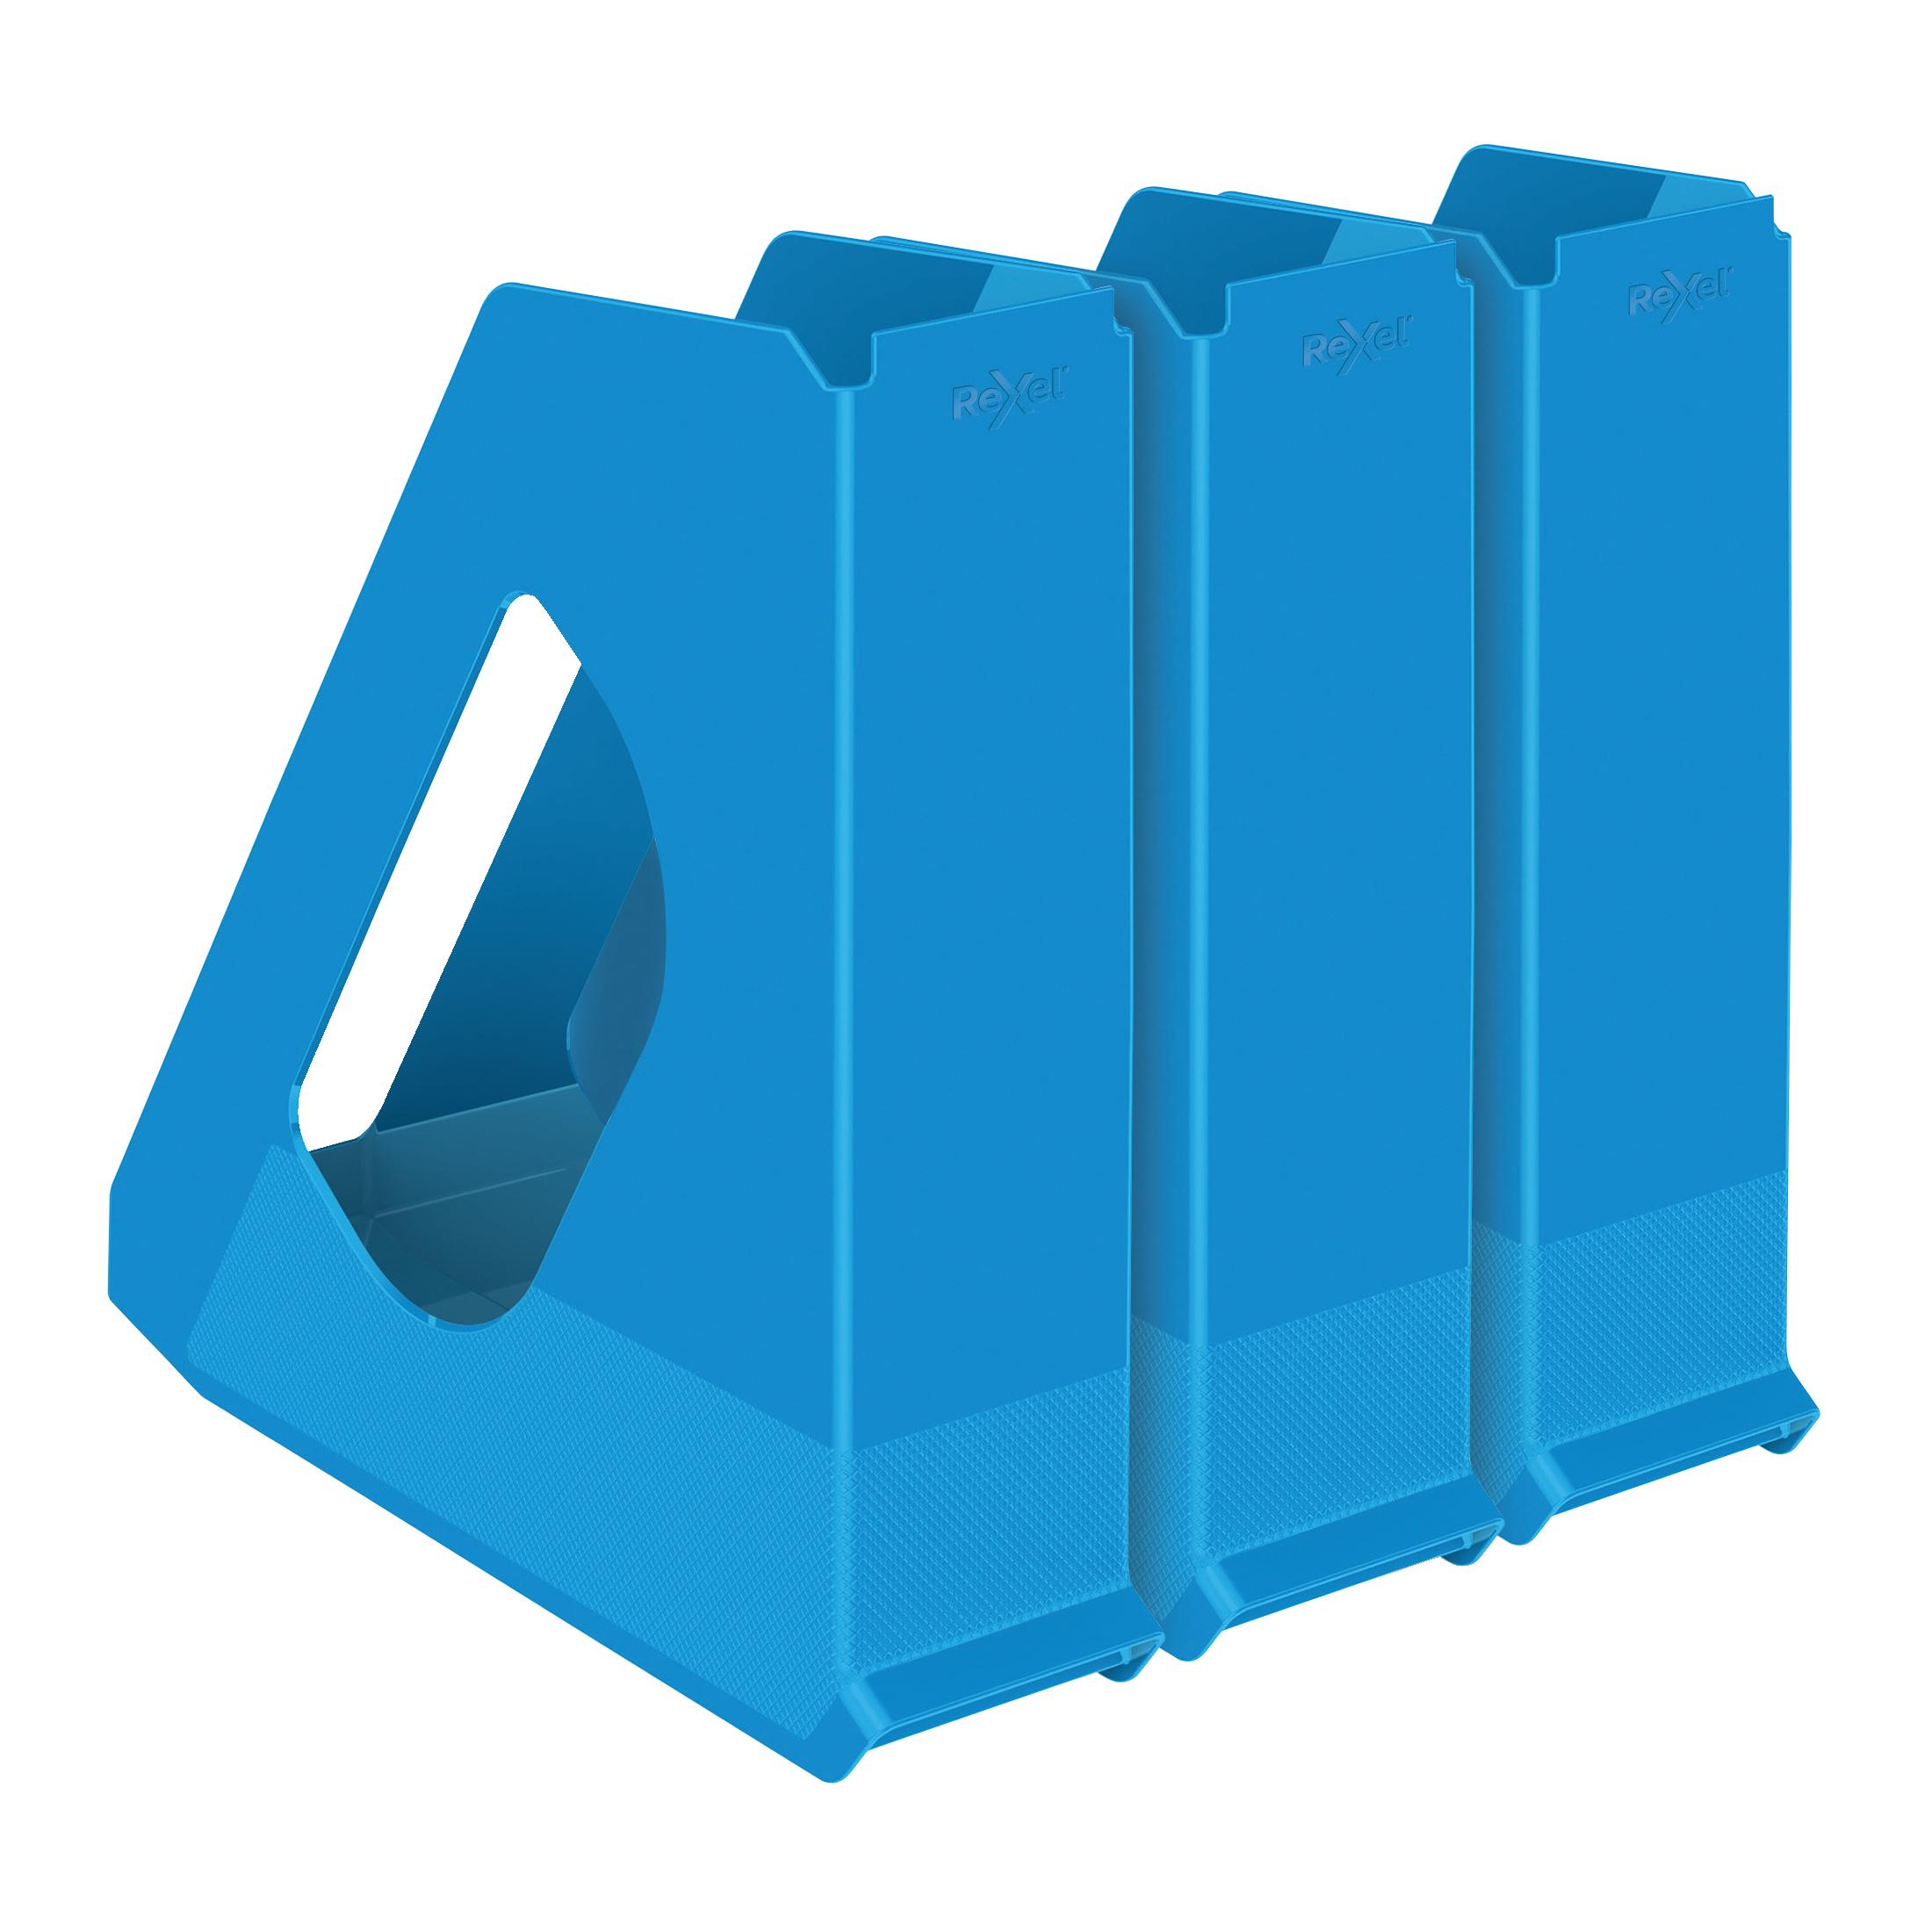 Rexel Choices Letter Trays A4 x3 & Mag Files x3 PP Blue [Bundle Offer & FREE Matador Stapler] Jan-Mar 20